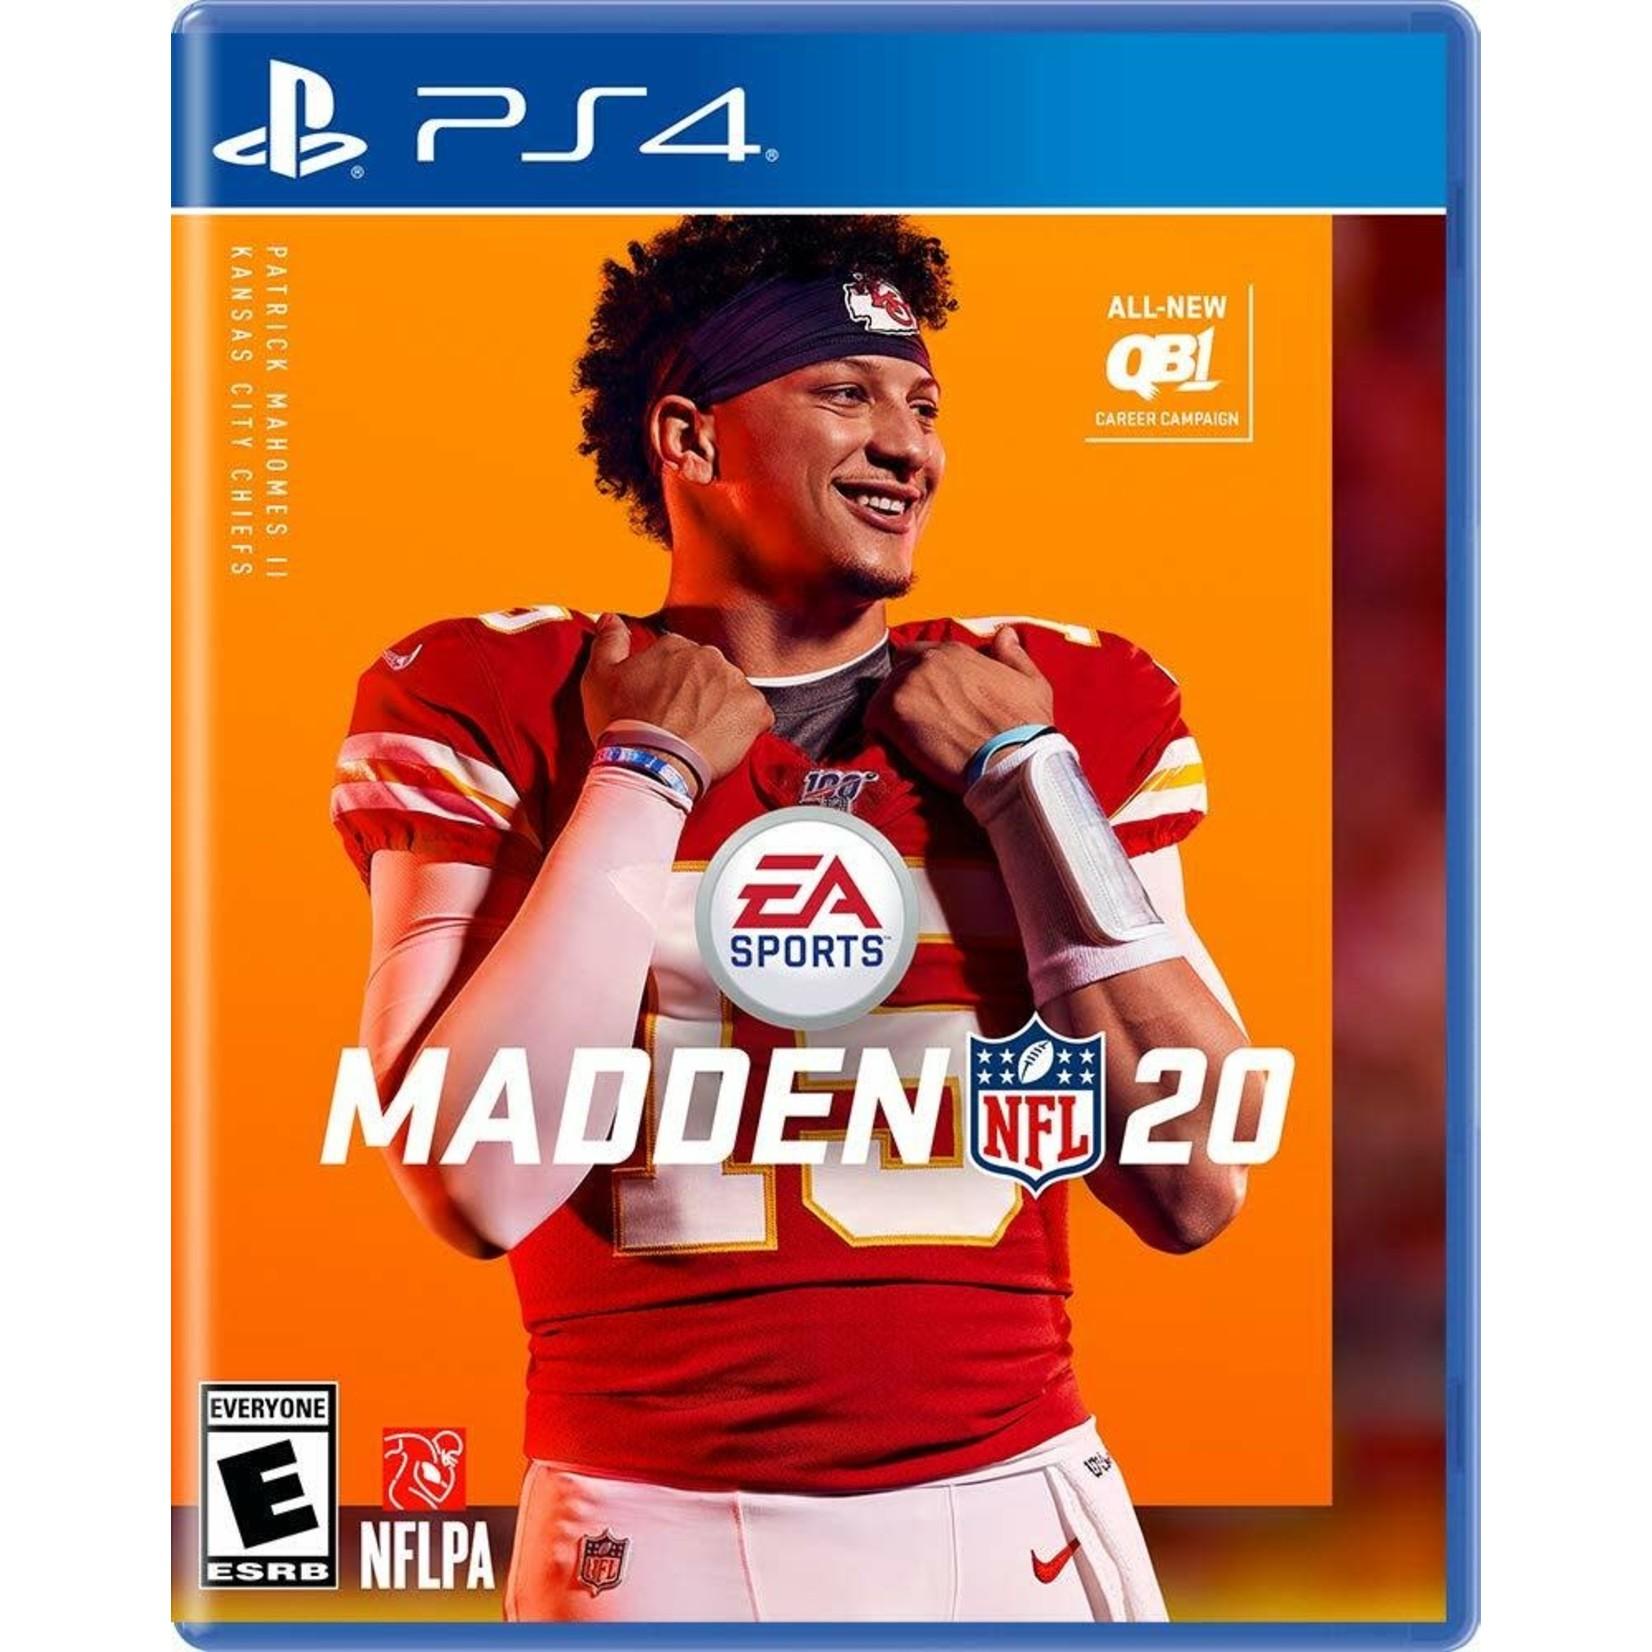 PS4-Madden NFL 20